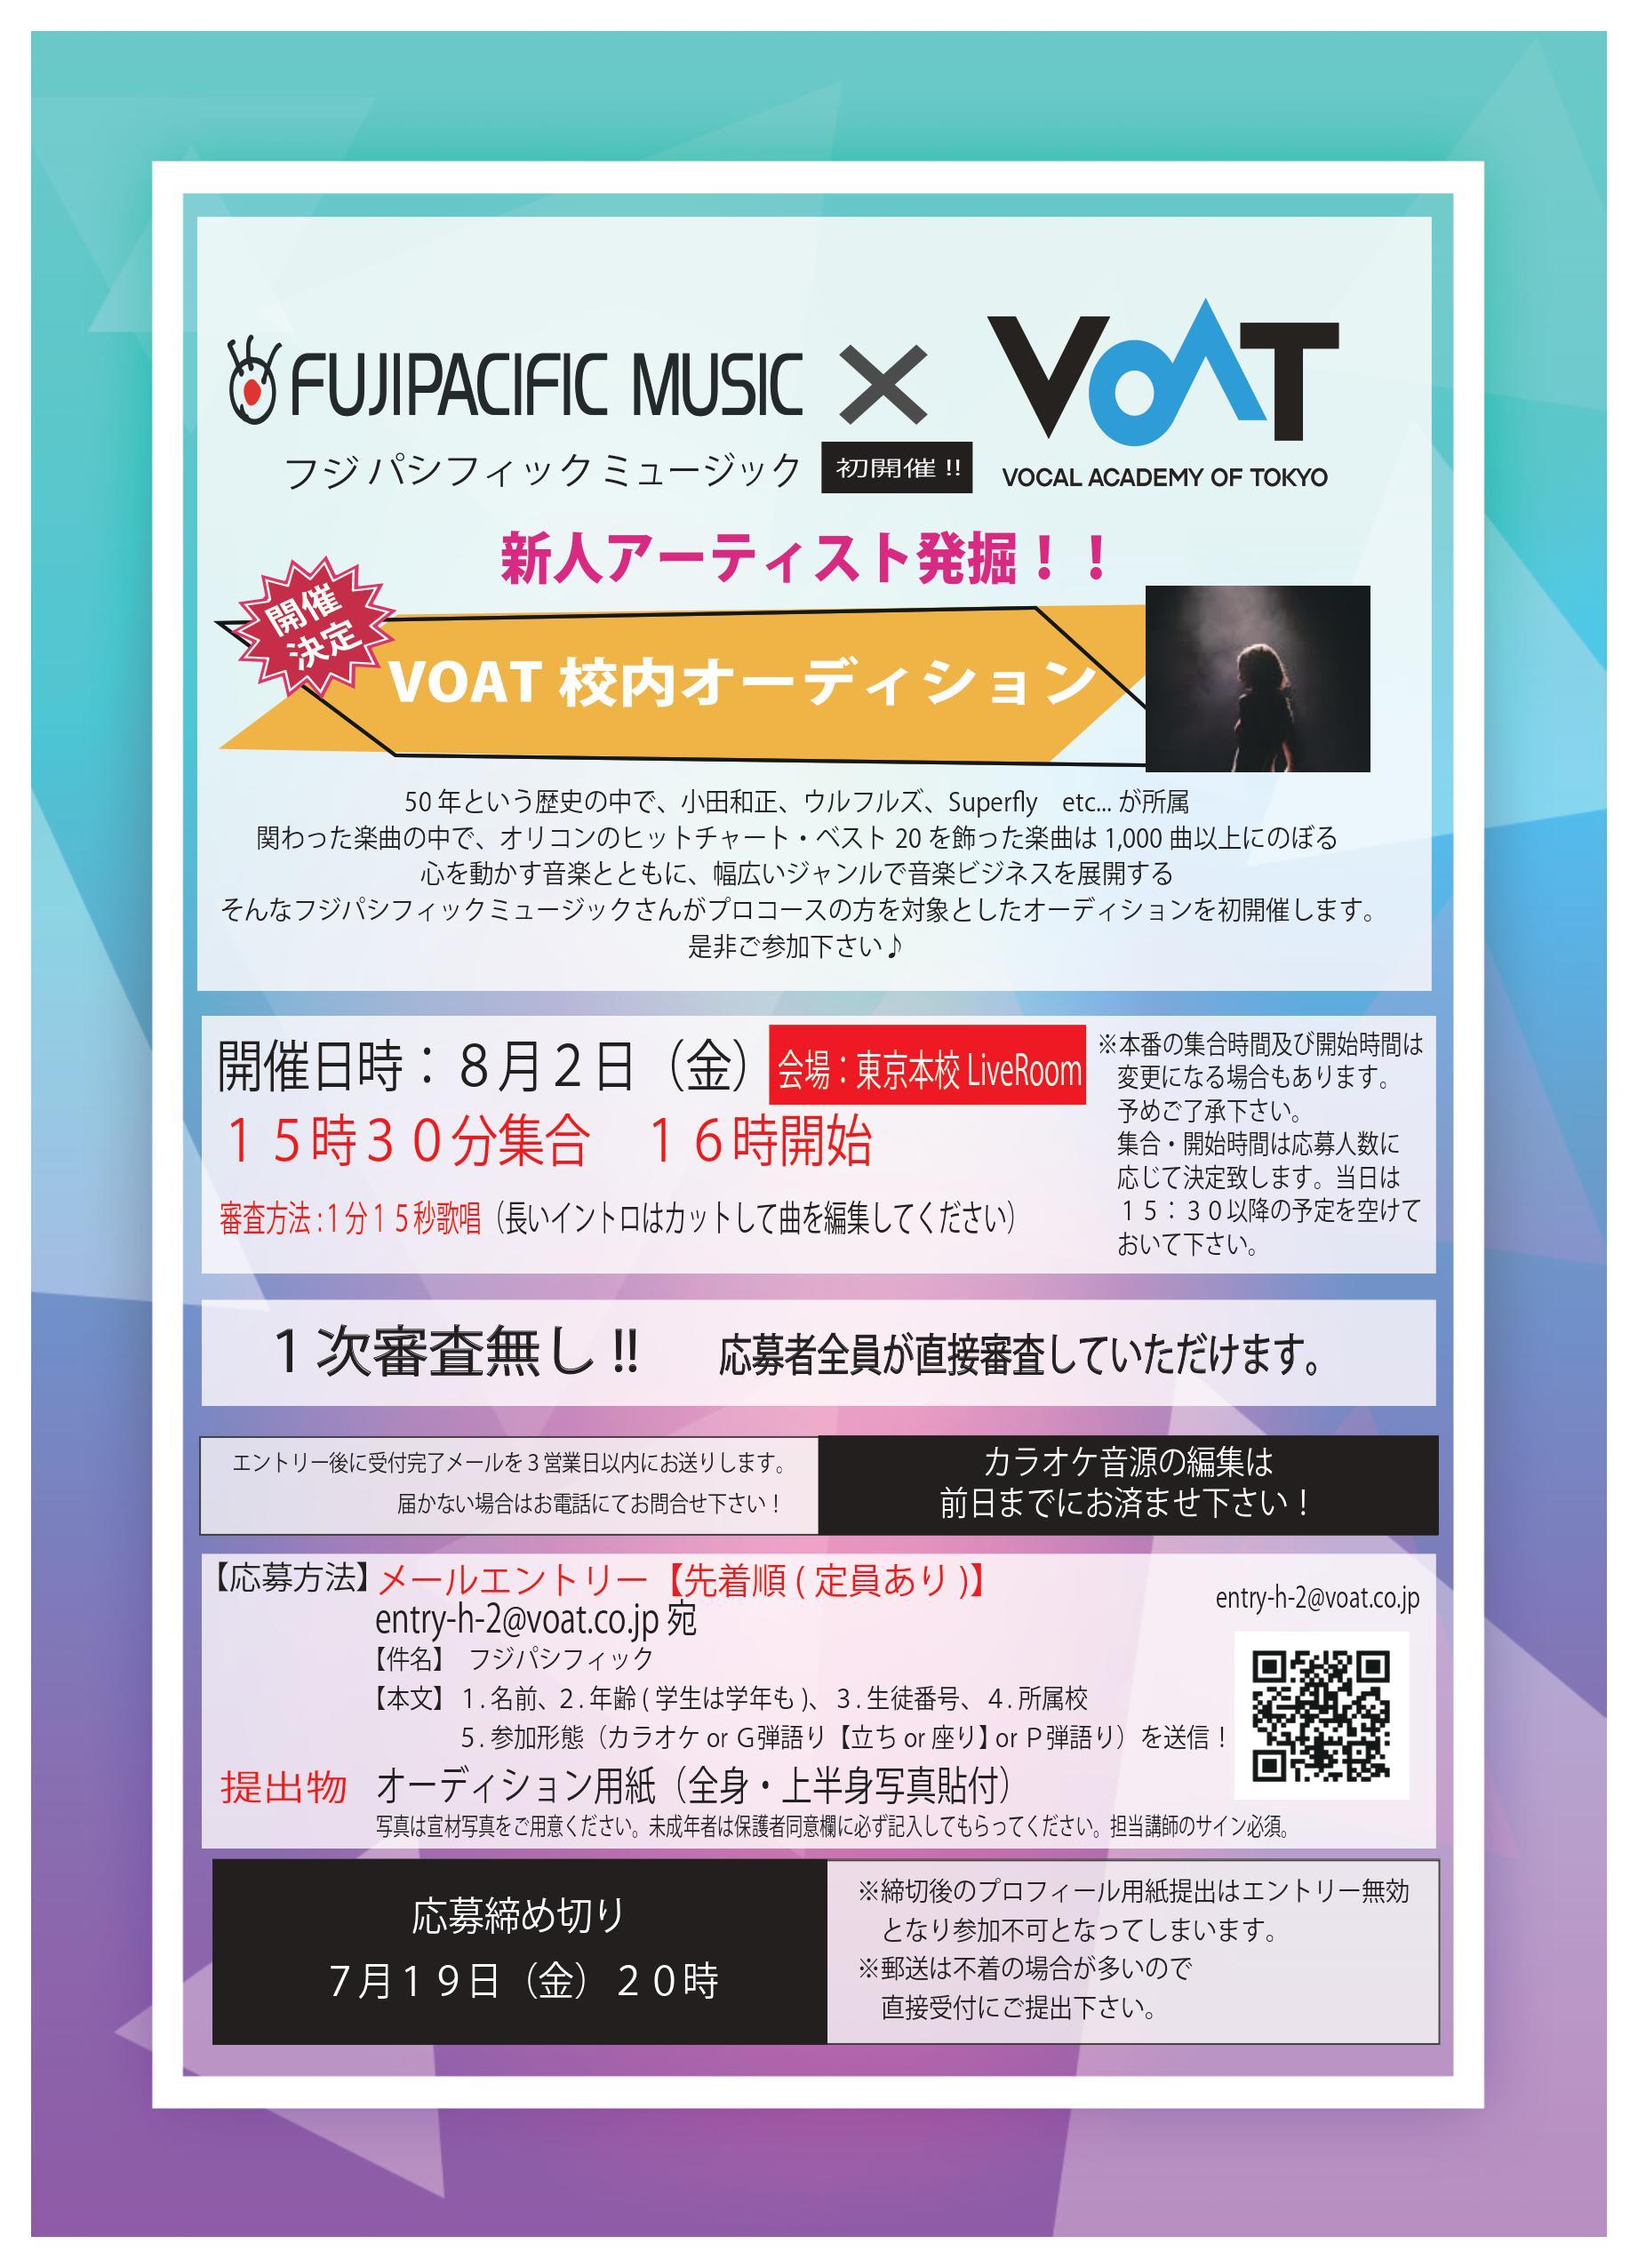 2019_08_02_FUJIPACIFIC MUSIC_告知用.jpg